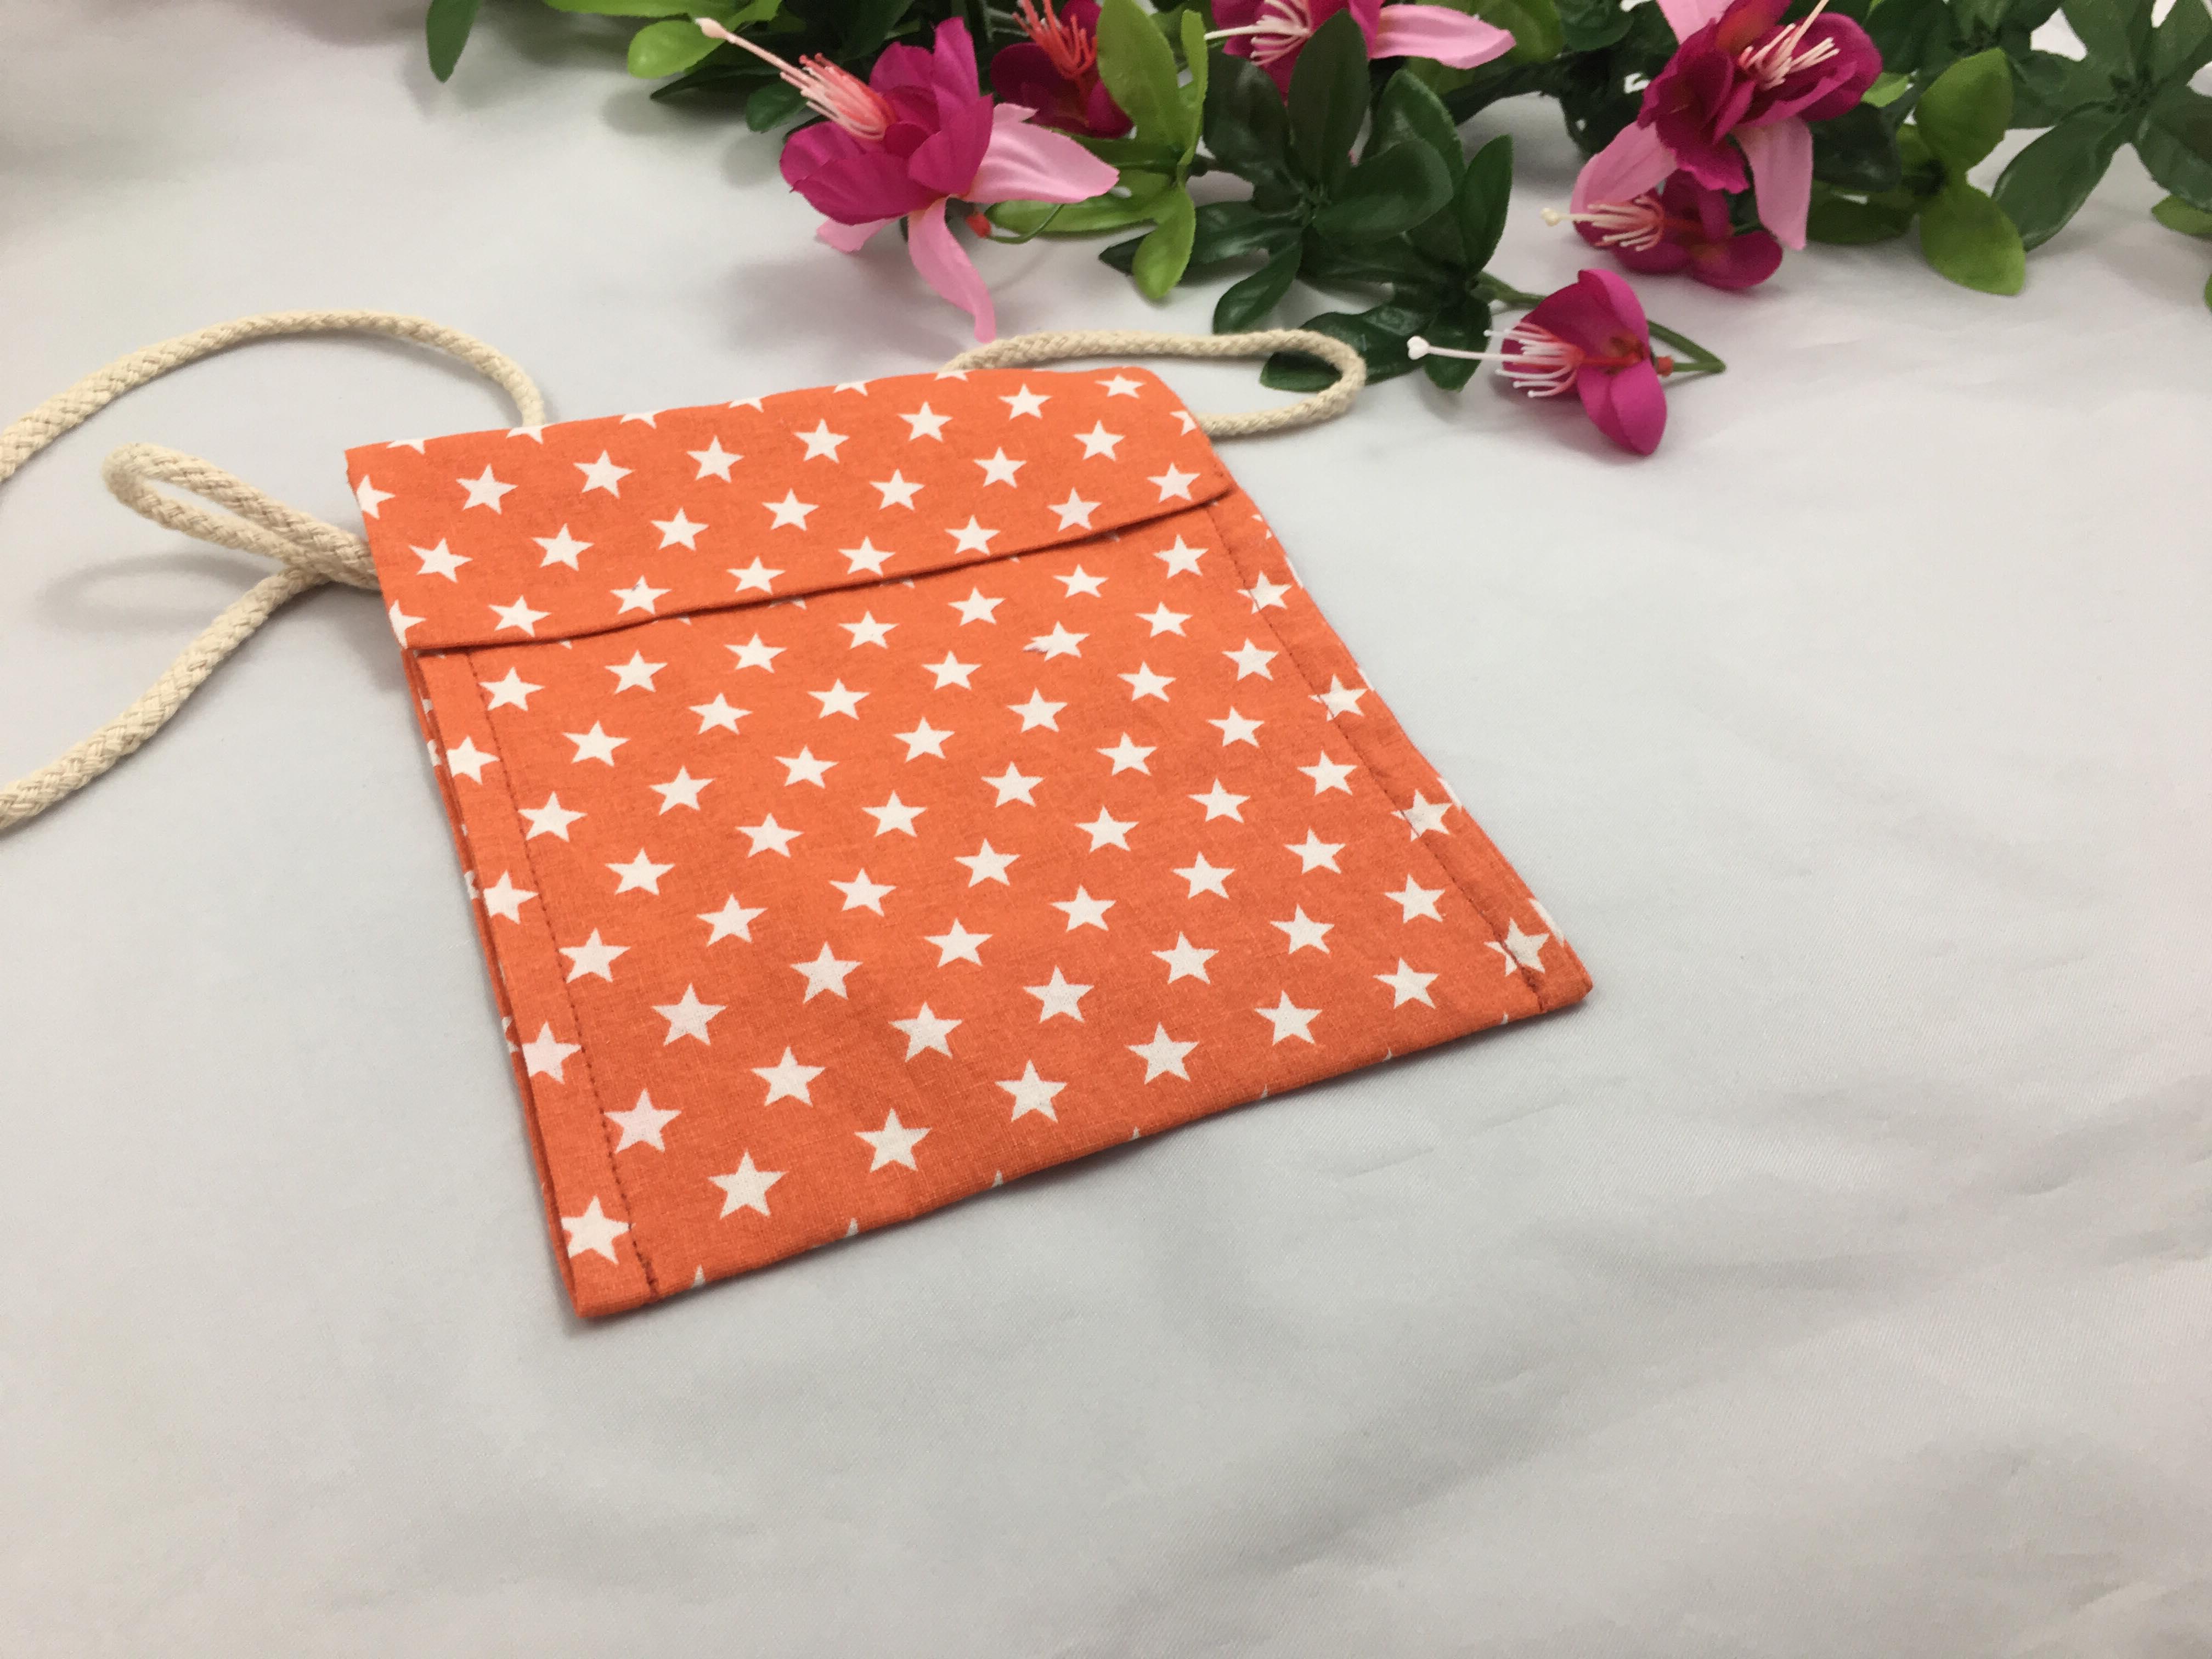 Besace orange étoiles blanches 6